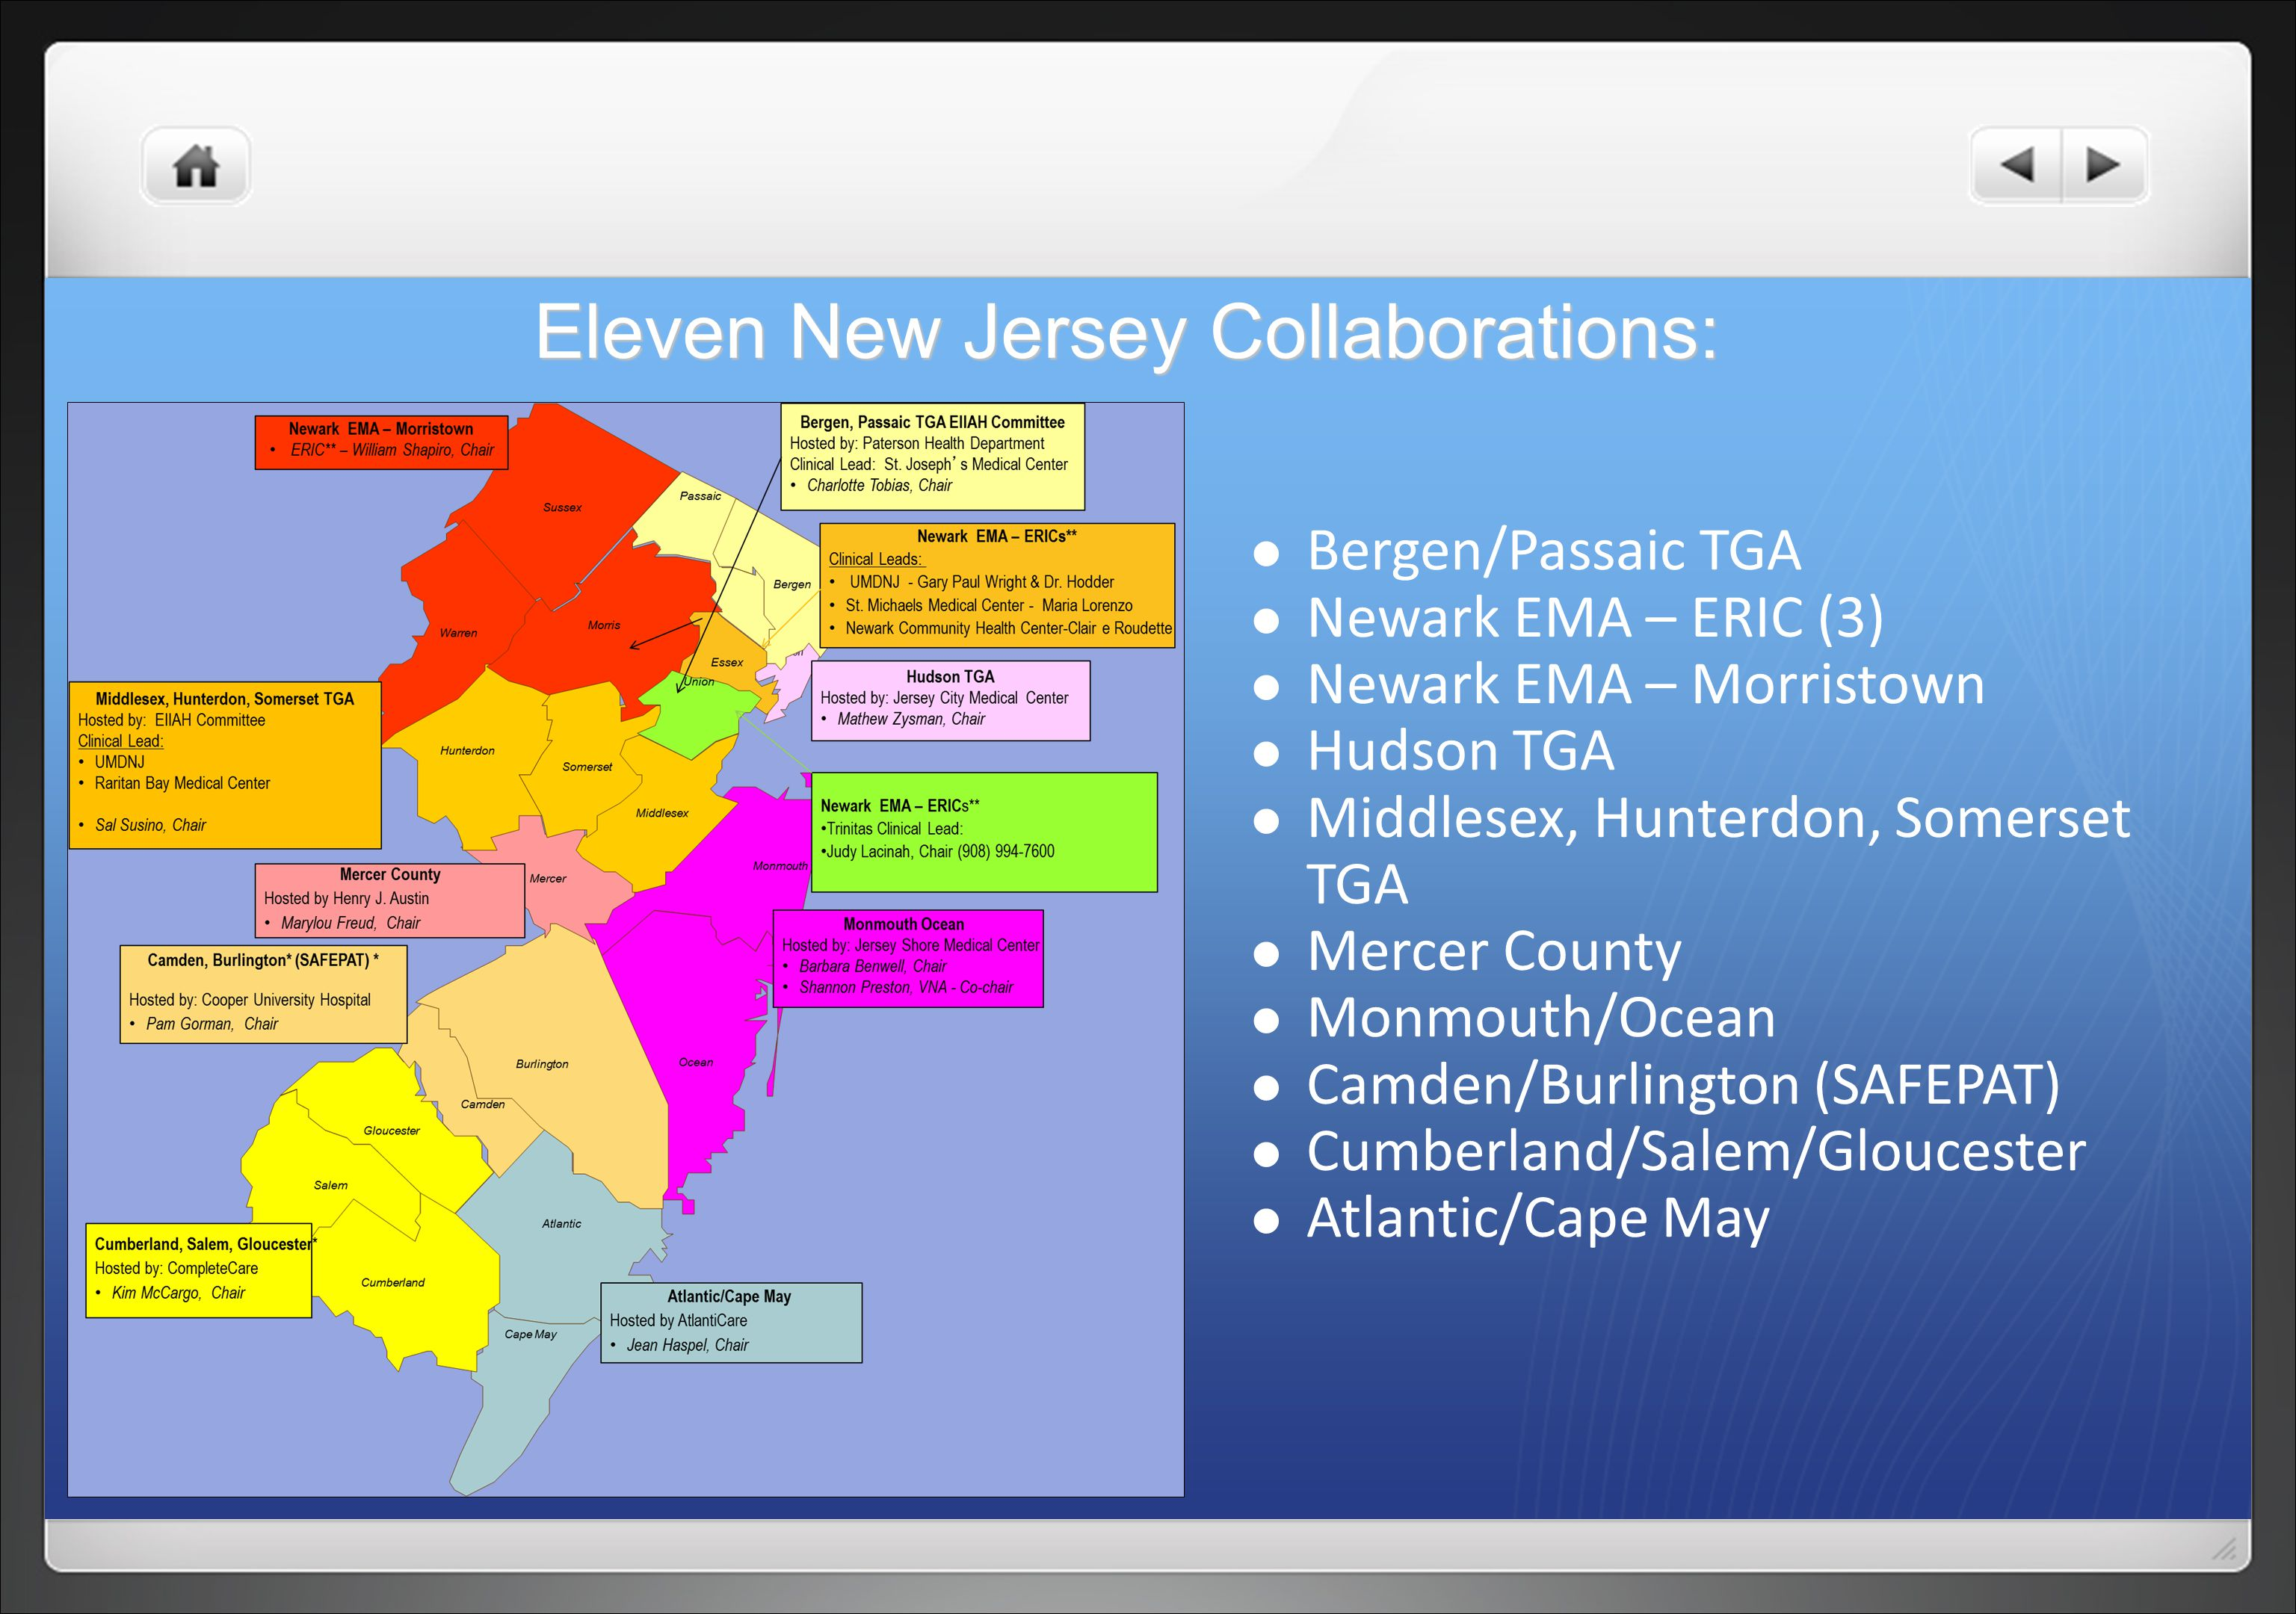 Eleven New Jersey Collaborations: Bergen/Passaic TGA Newark EMA – ERIC (3) Newark EMA – Morristown Hudson TGA Middlesex, Hunterdon, Somerset TGA Mercer County Monmouth/Ocean Camden/Burlington (SAFEPAT) Cumberland/Salem/Gloucester Atlantic/Cape May